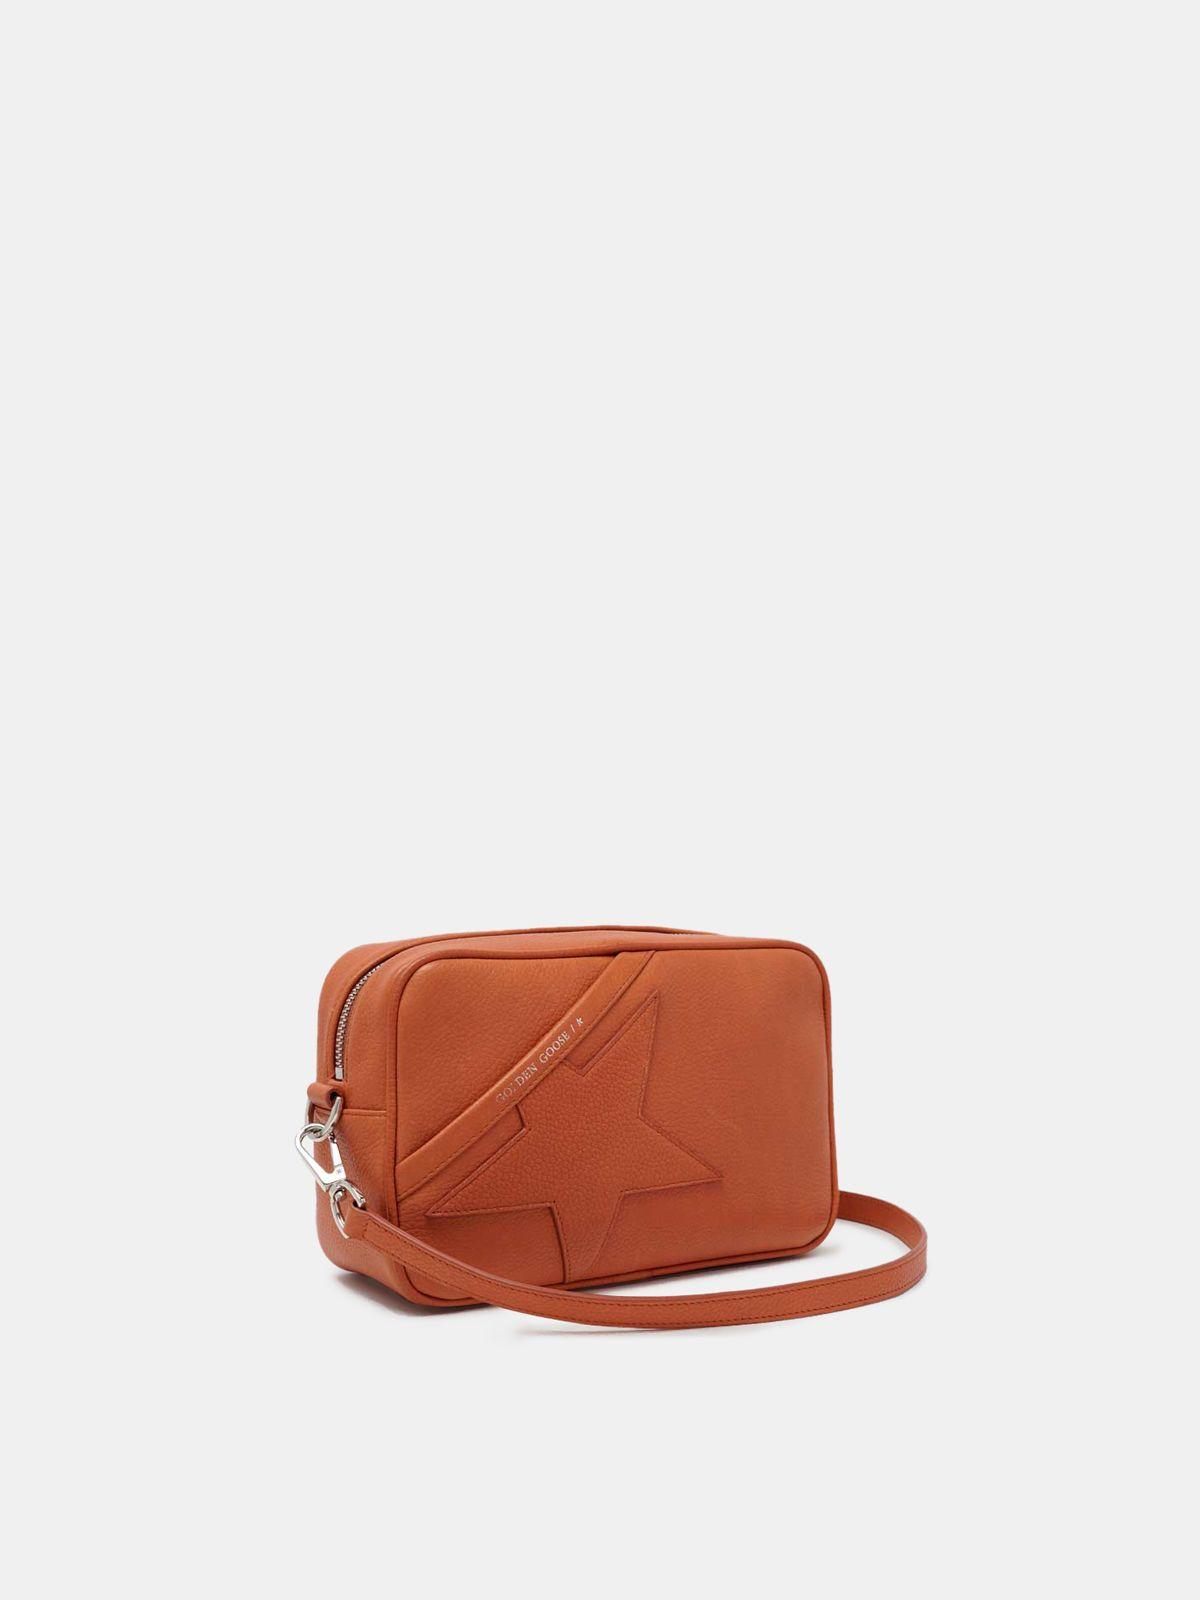 Golden Goose - Borsa Star Bag arancio a tracolla in pelle granata in